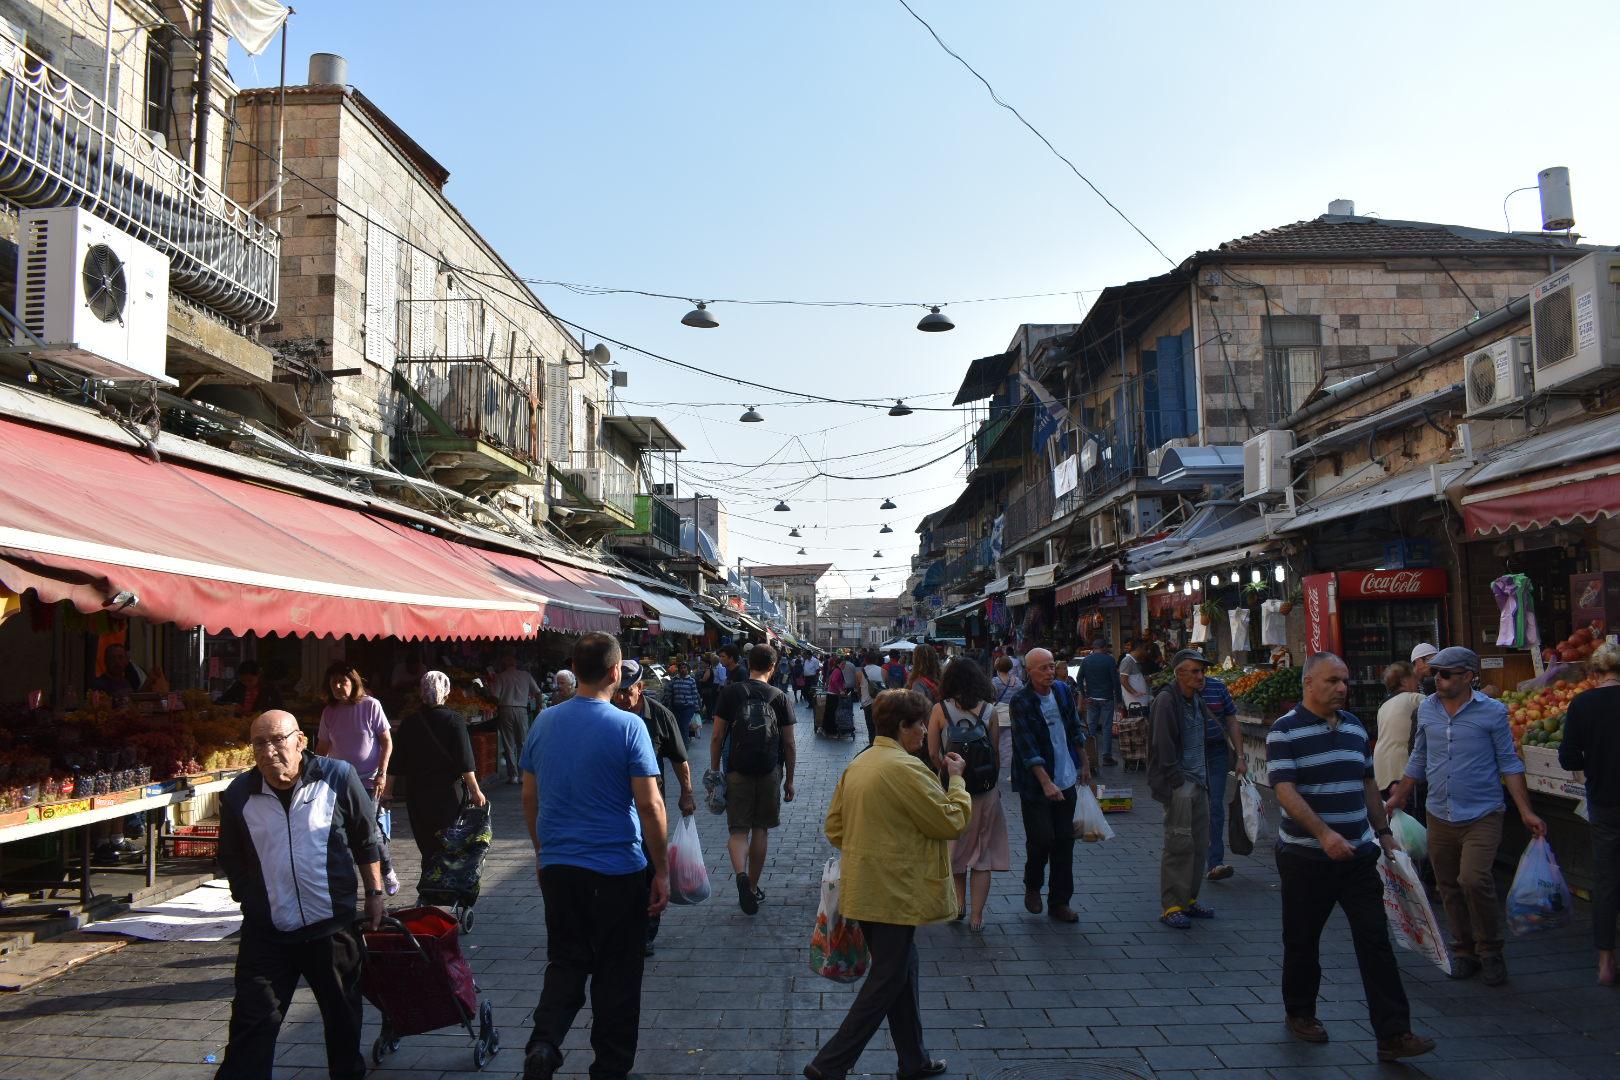 Markets in Israel - Mahine Yehuda, Jerusalem